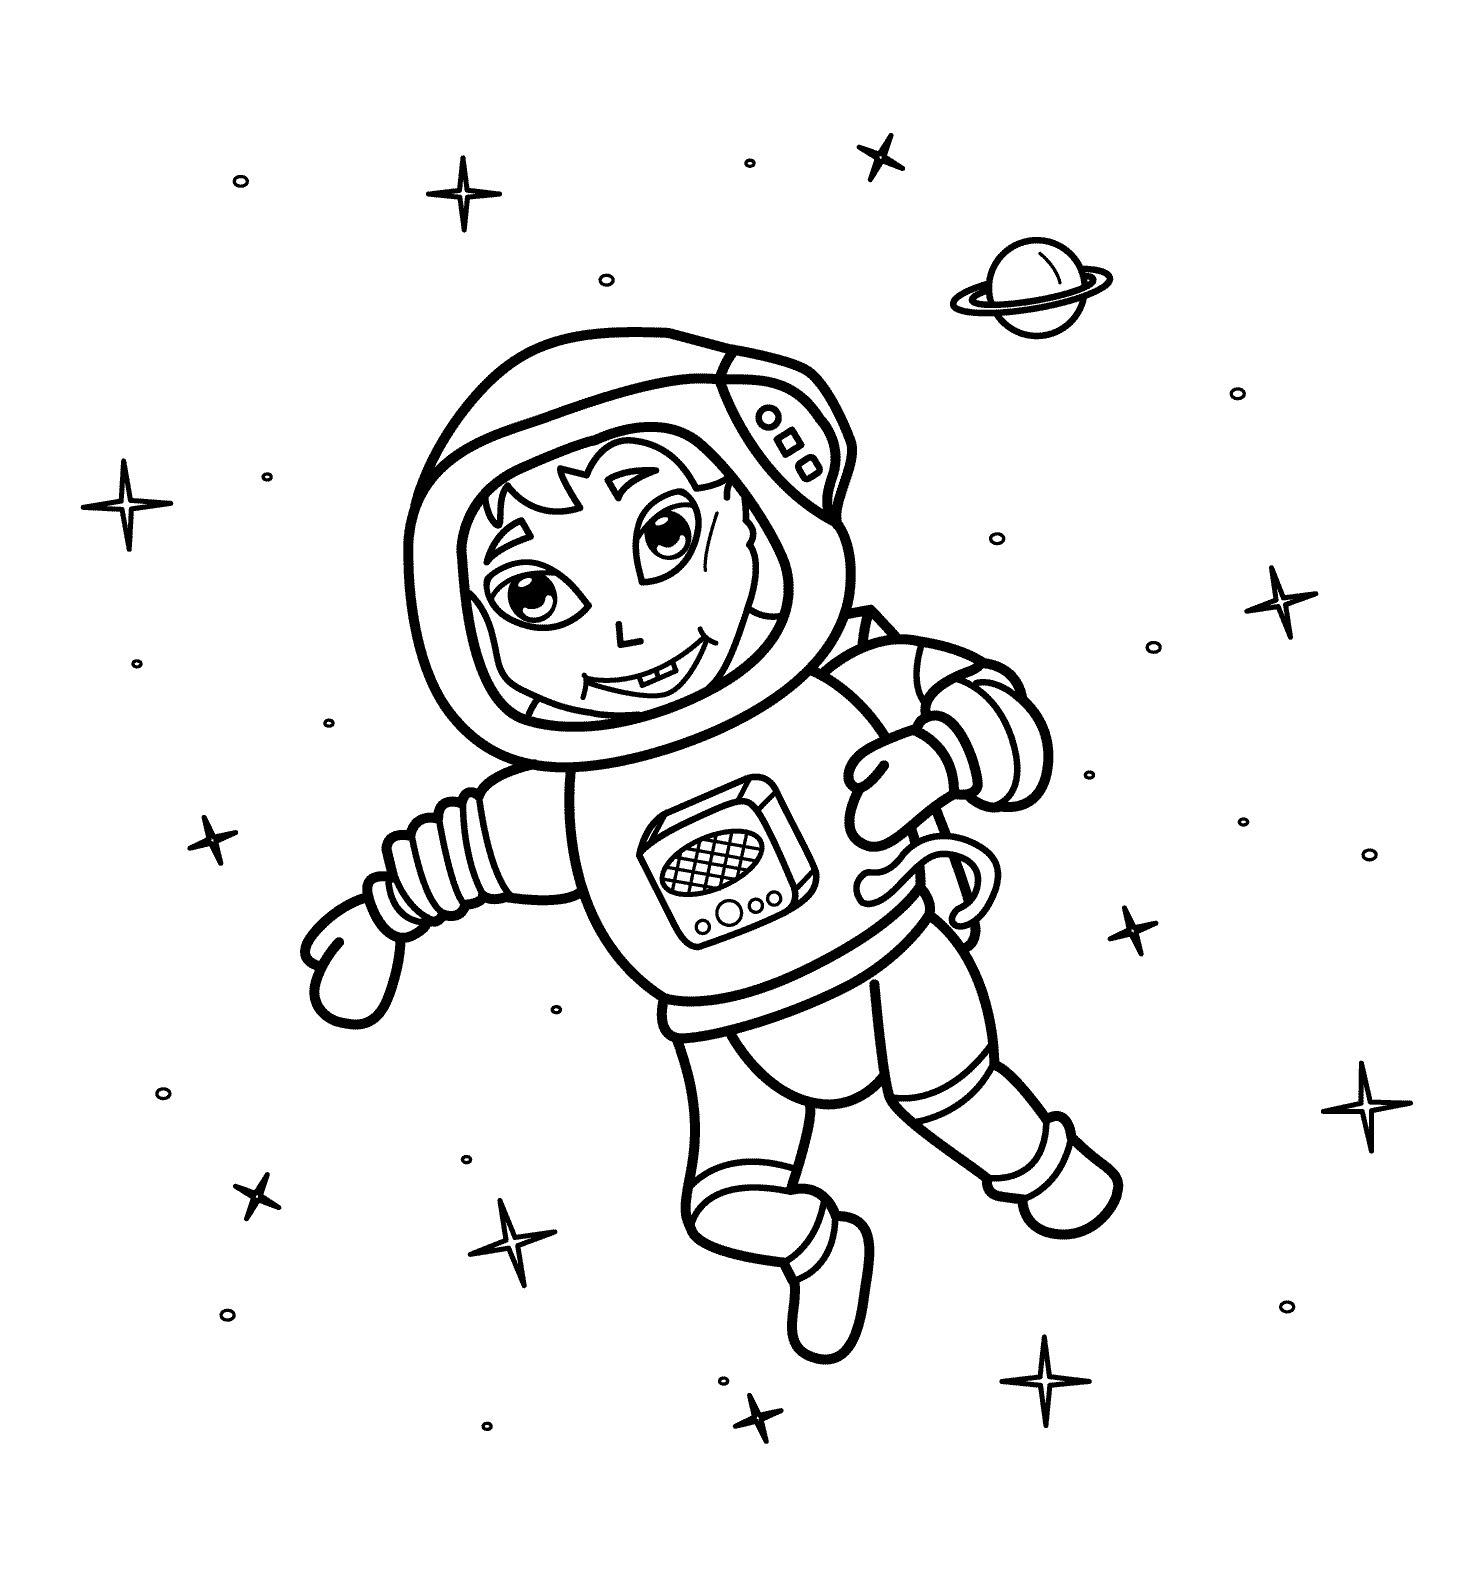 frais coloriage astronaute a imprimer